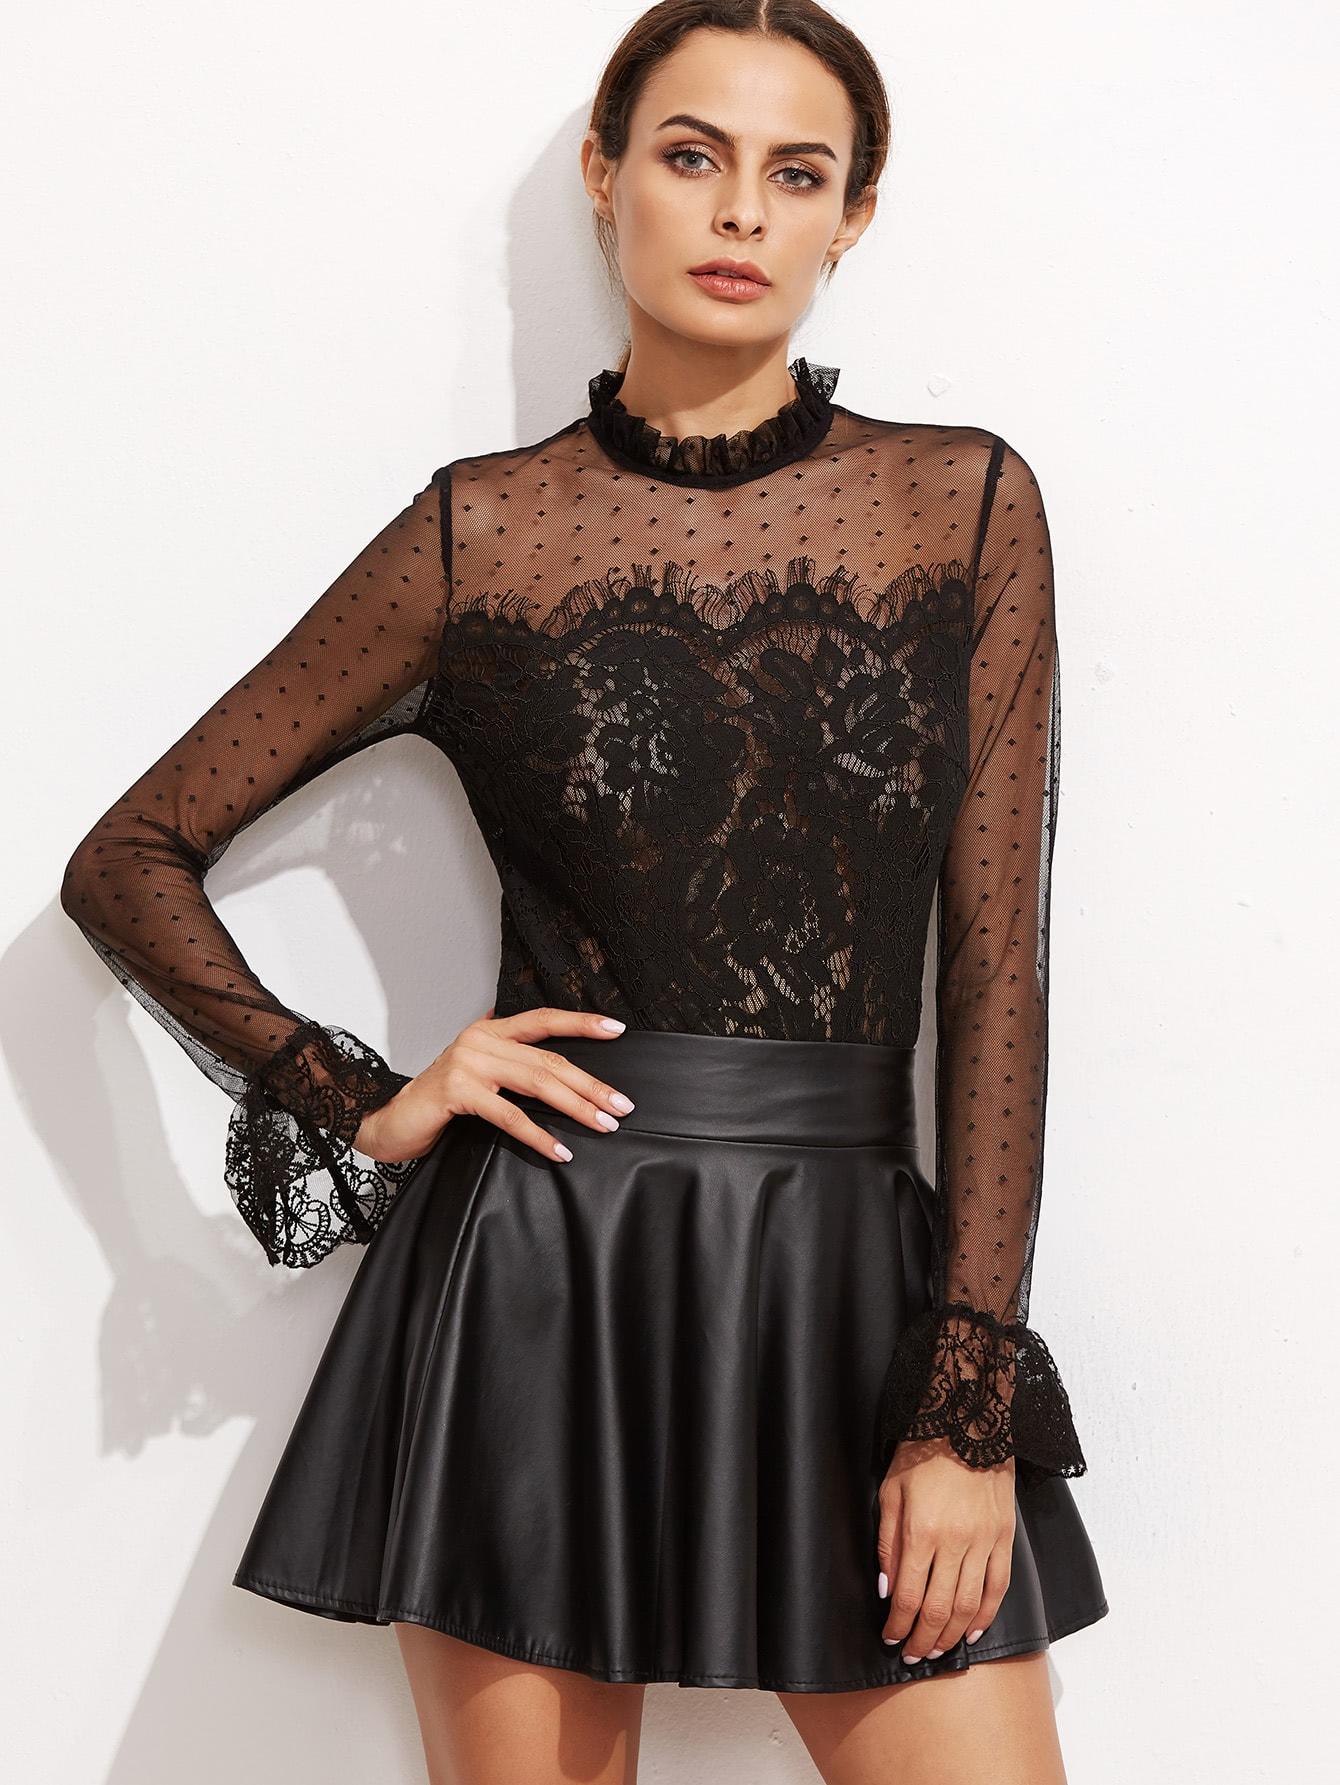 Black Fungus Collar Keyhole Back Lace Trim Top blouse161020705